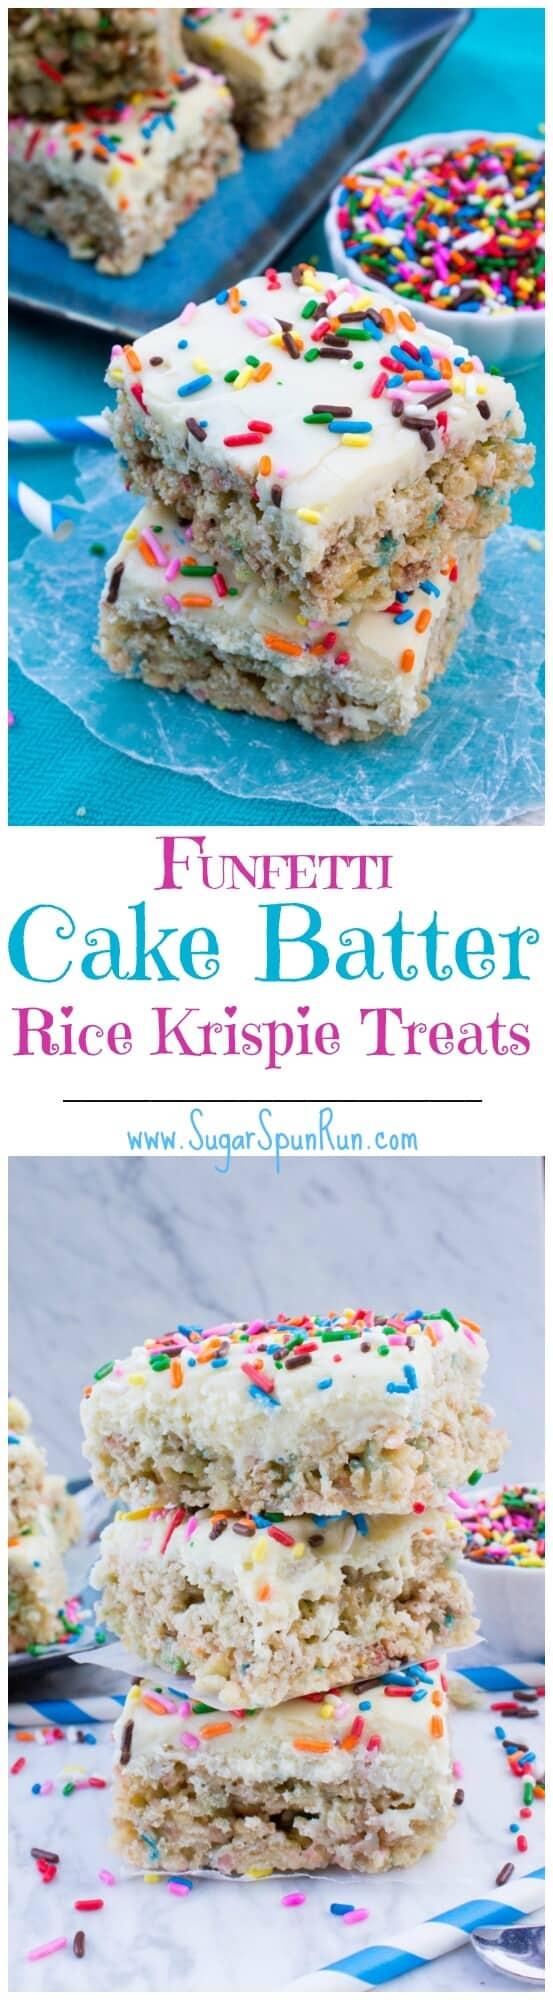 Funfetti Cake Batter Truffles